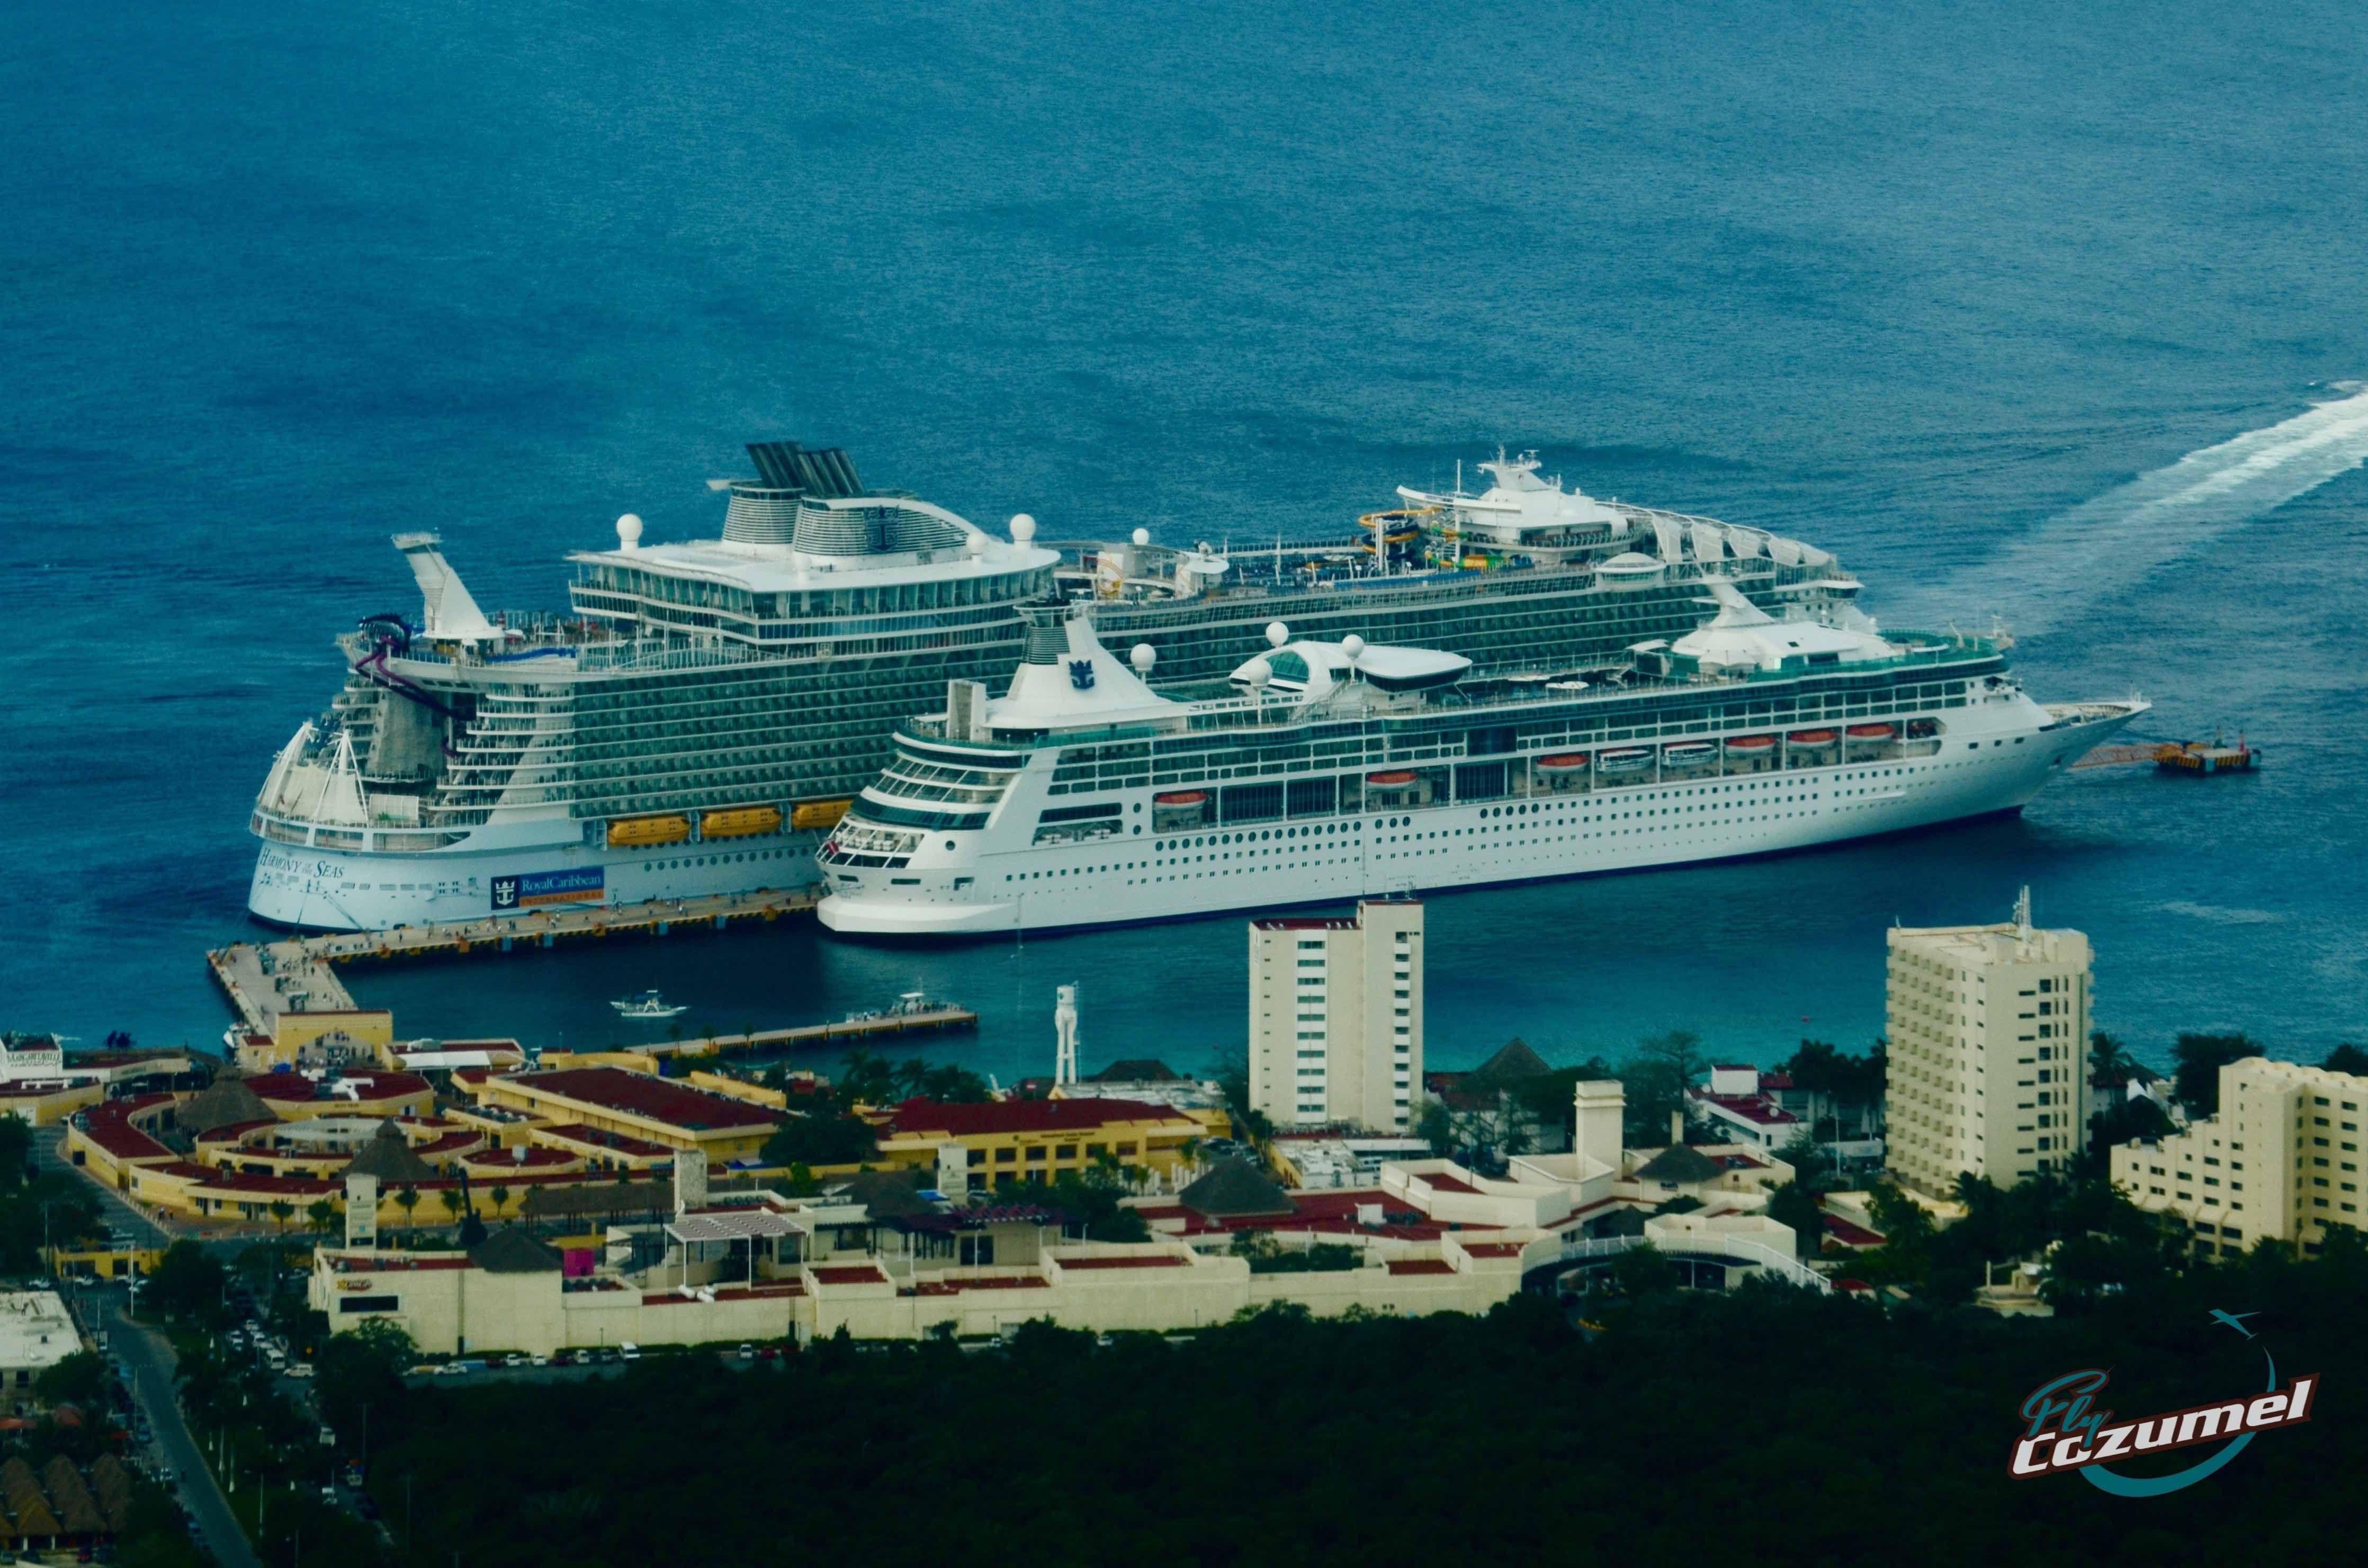 Yesterdays cruises in Cozumel Impressive views cozumel